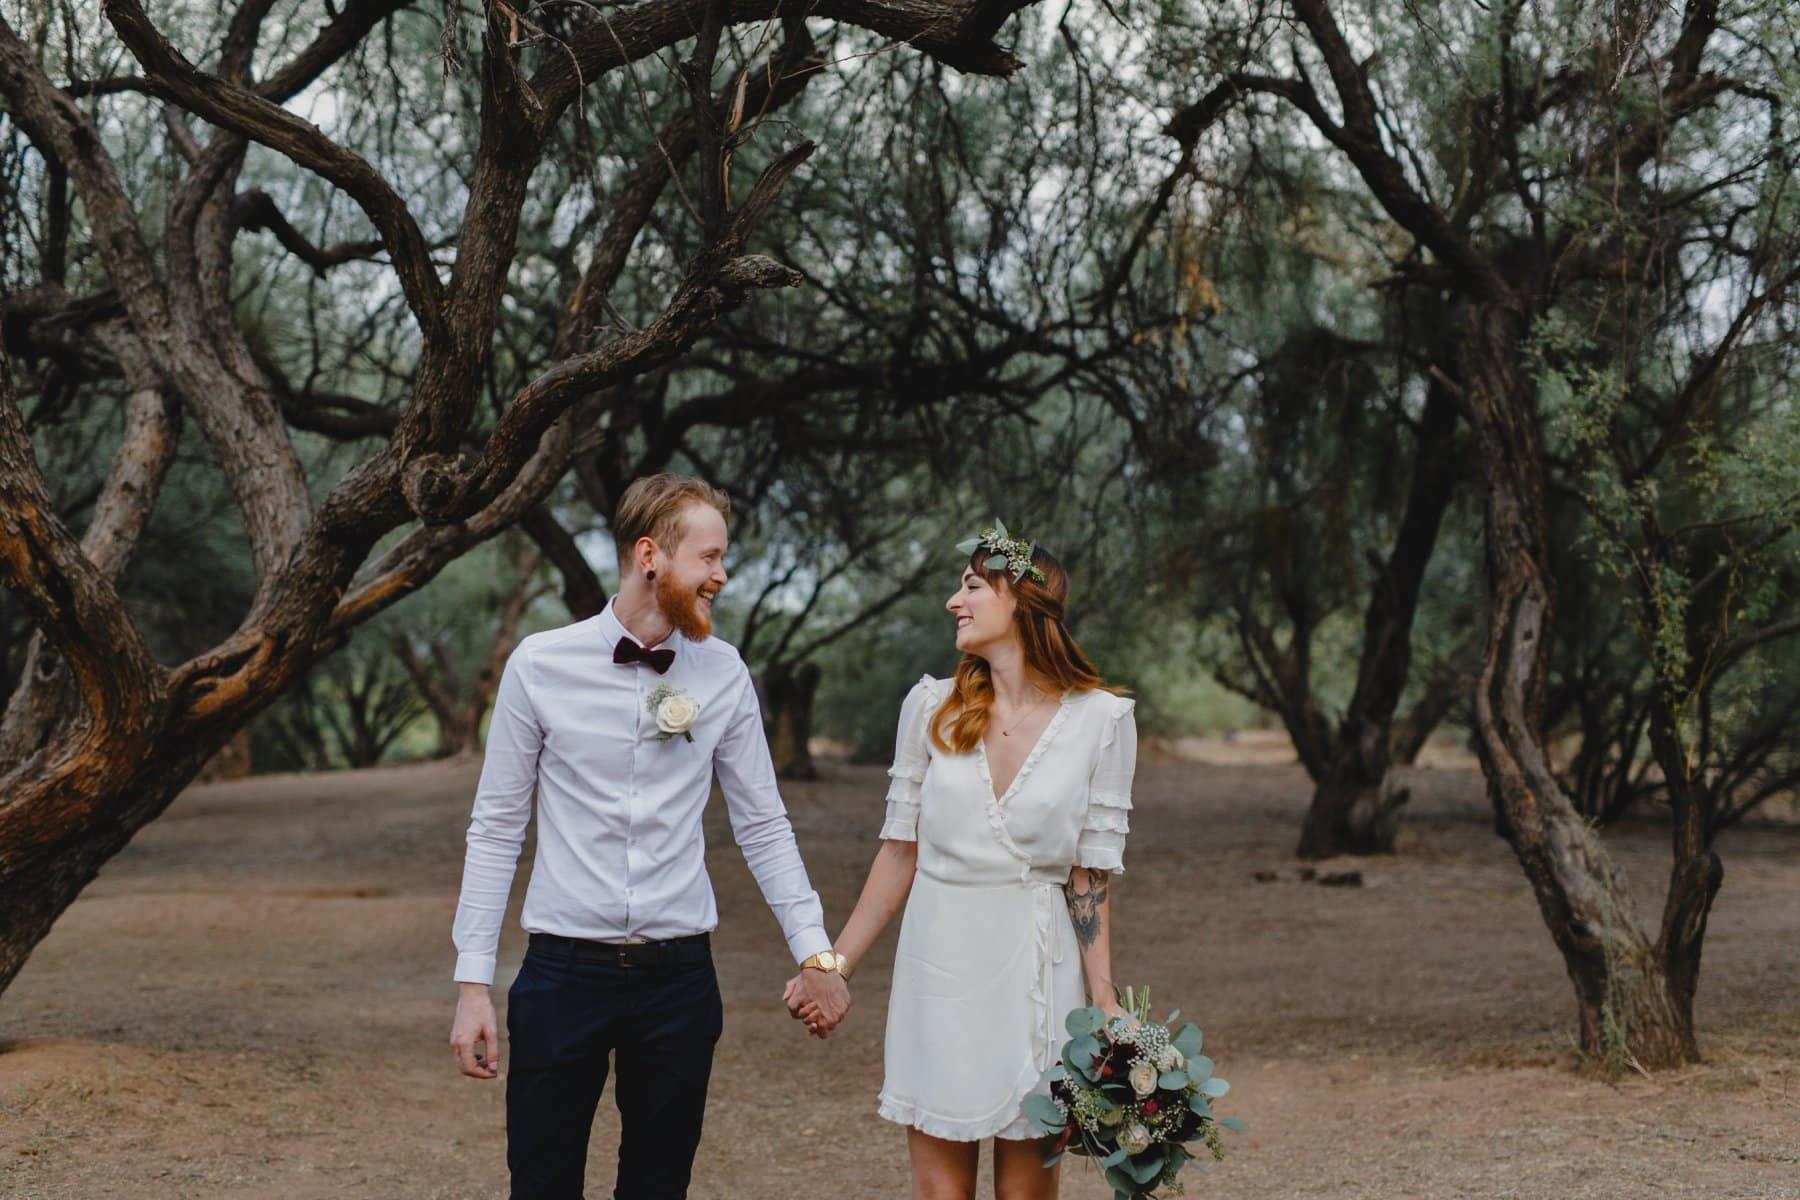 boho forest elopement location in Phoenix area